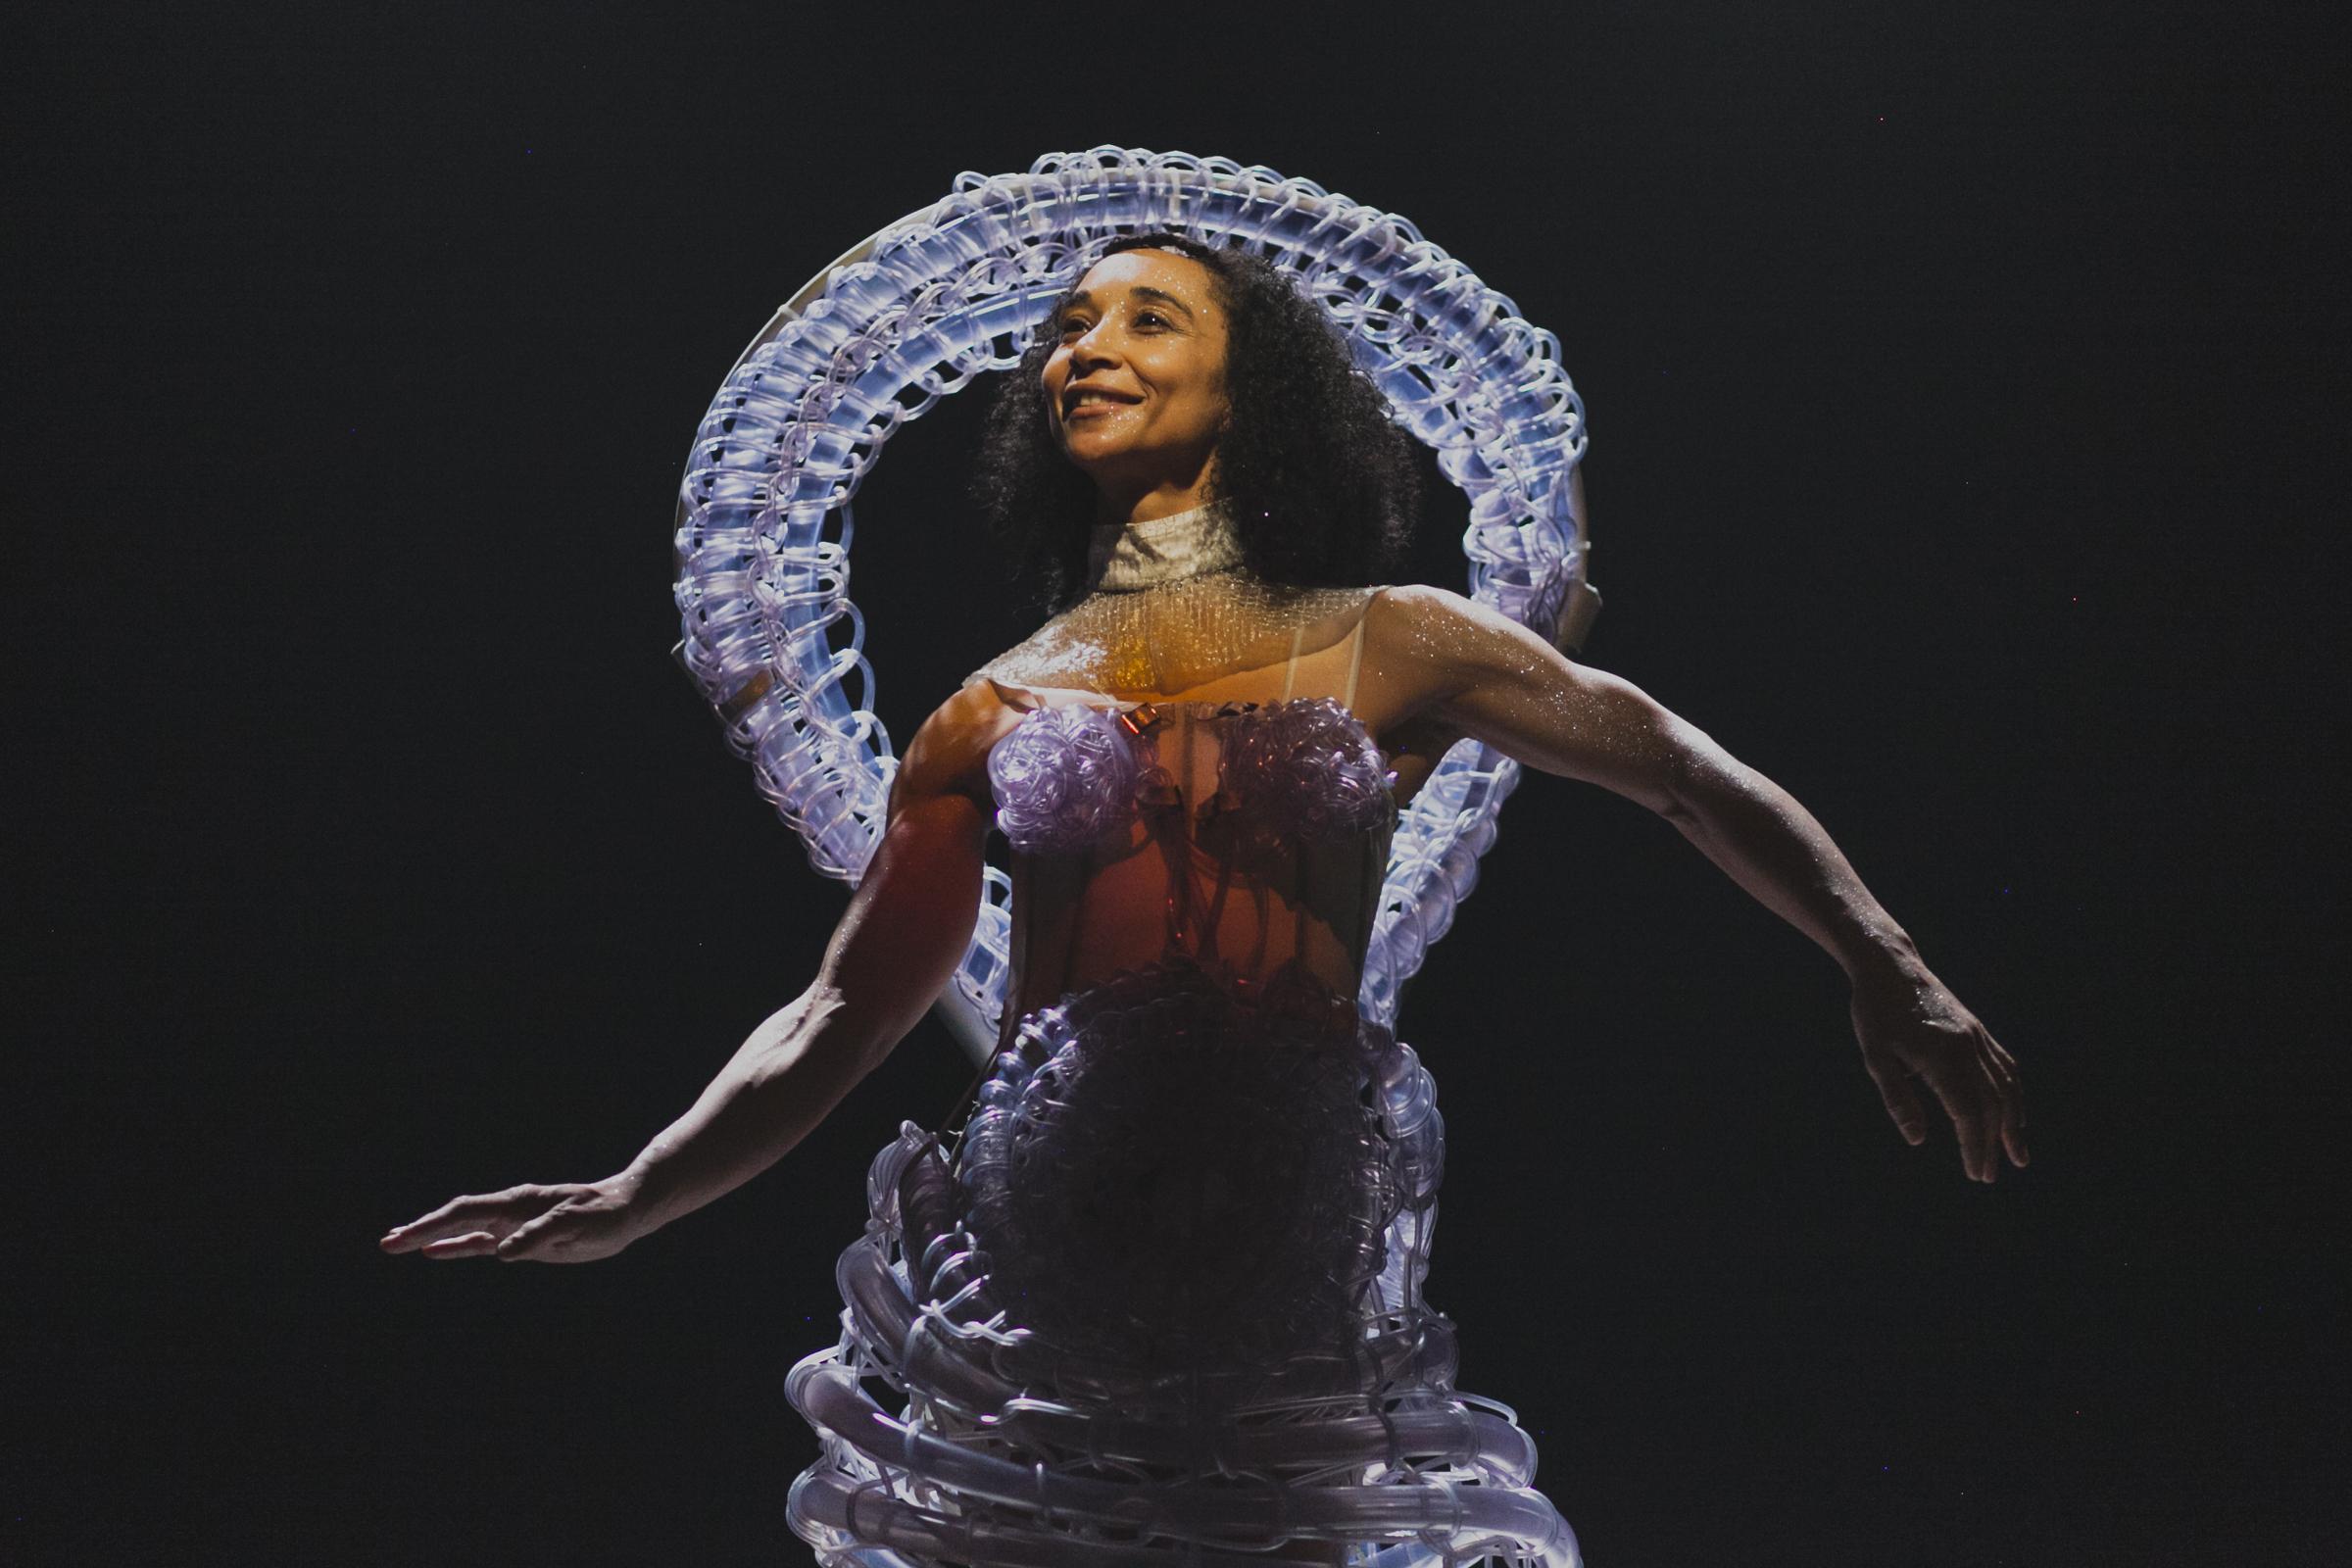 LCFMA19-CostumeShow-GabrielaLotaif-29.jpg